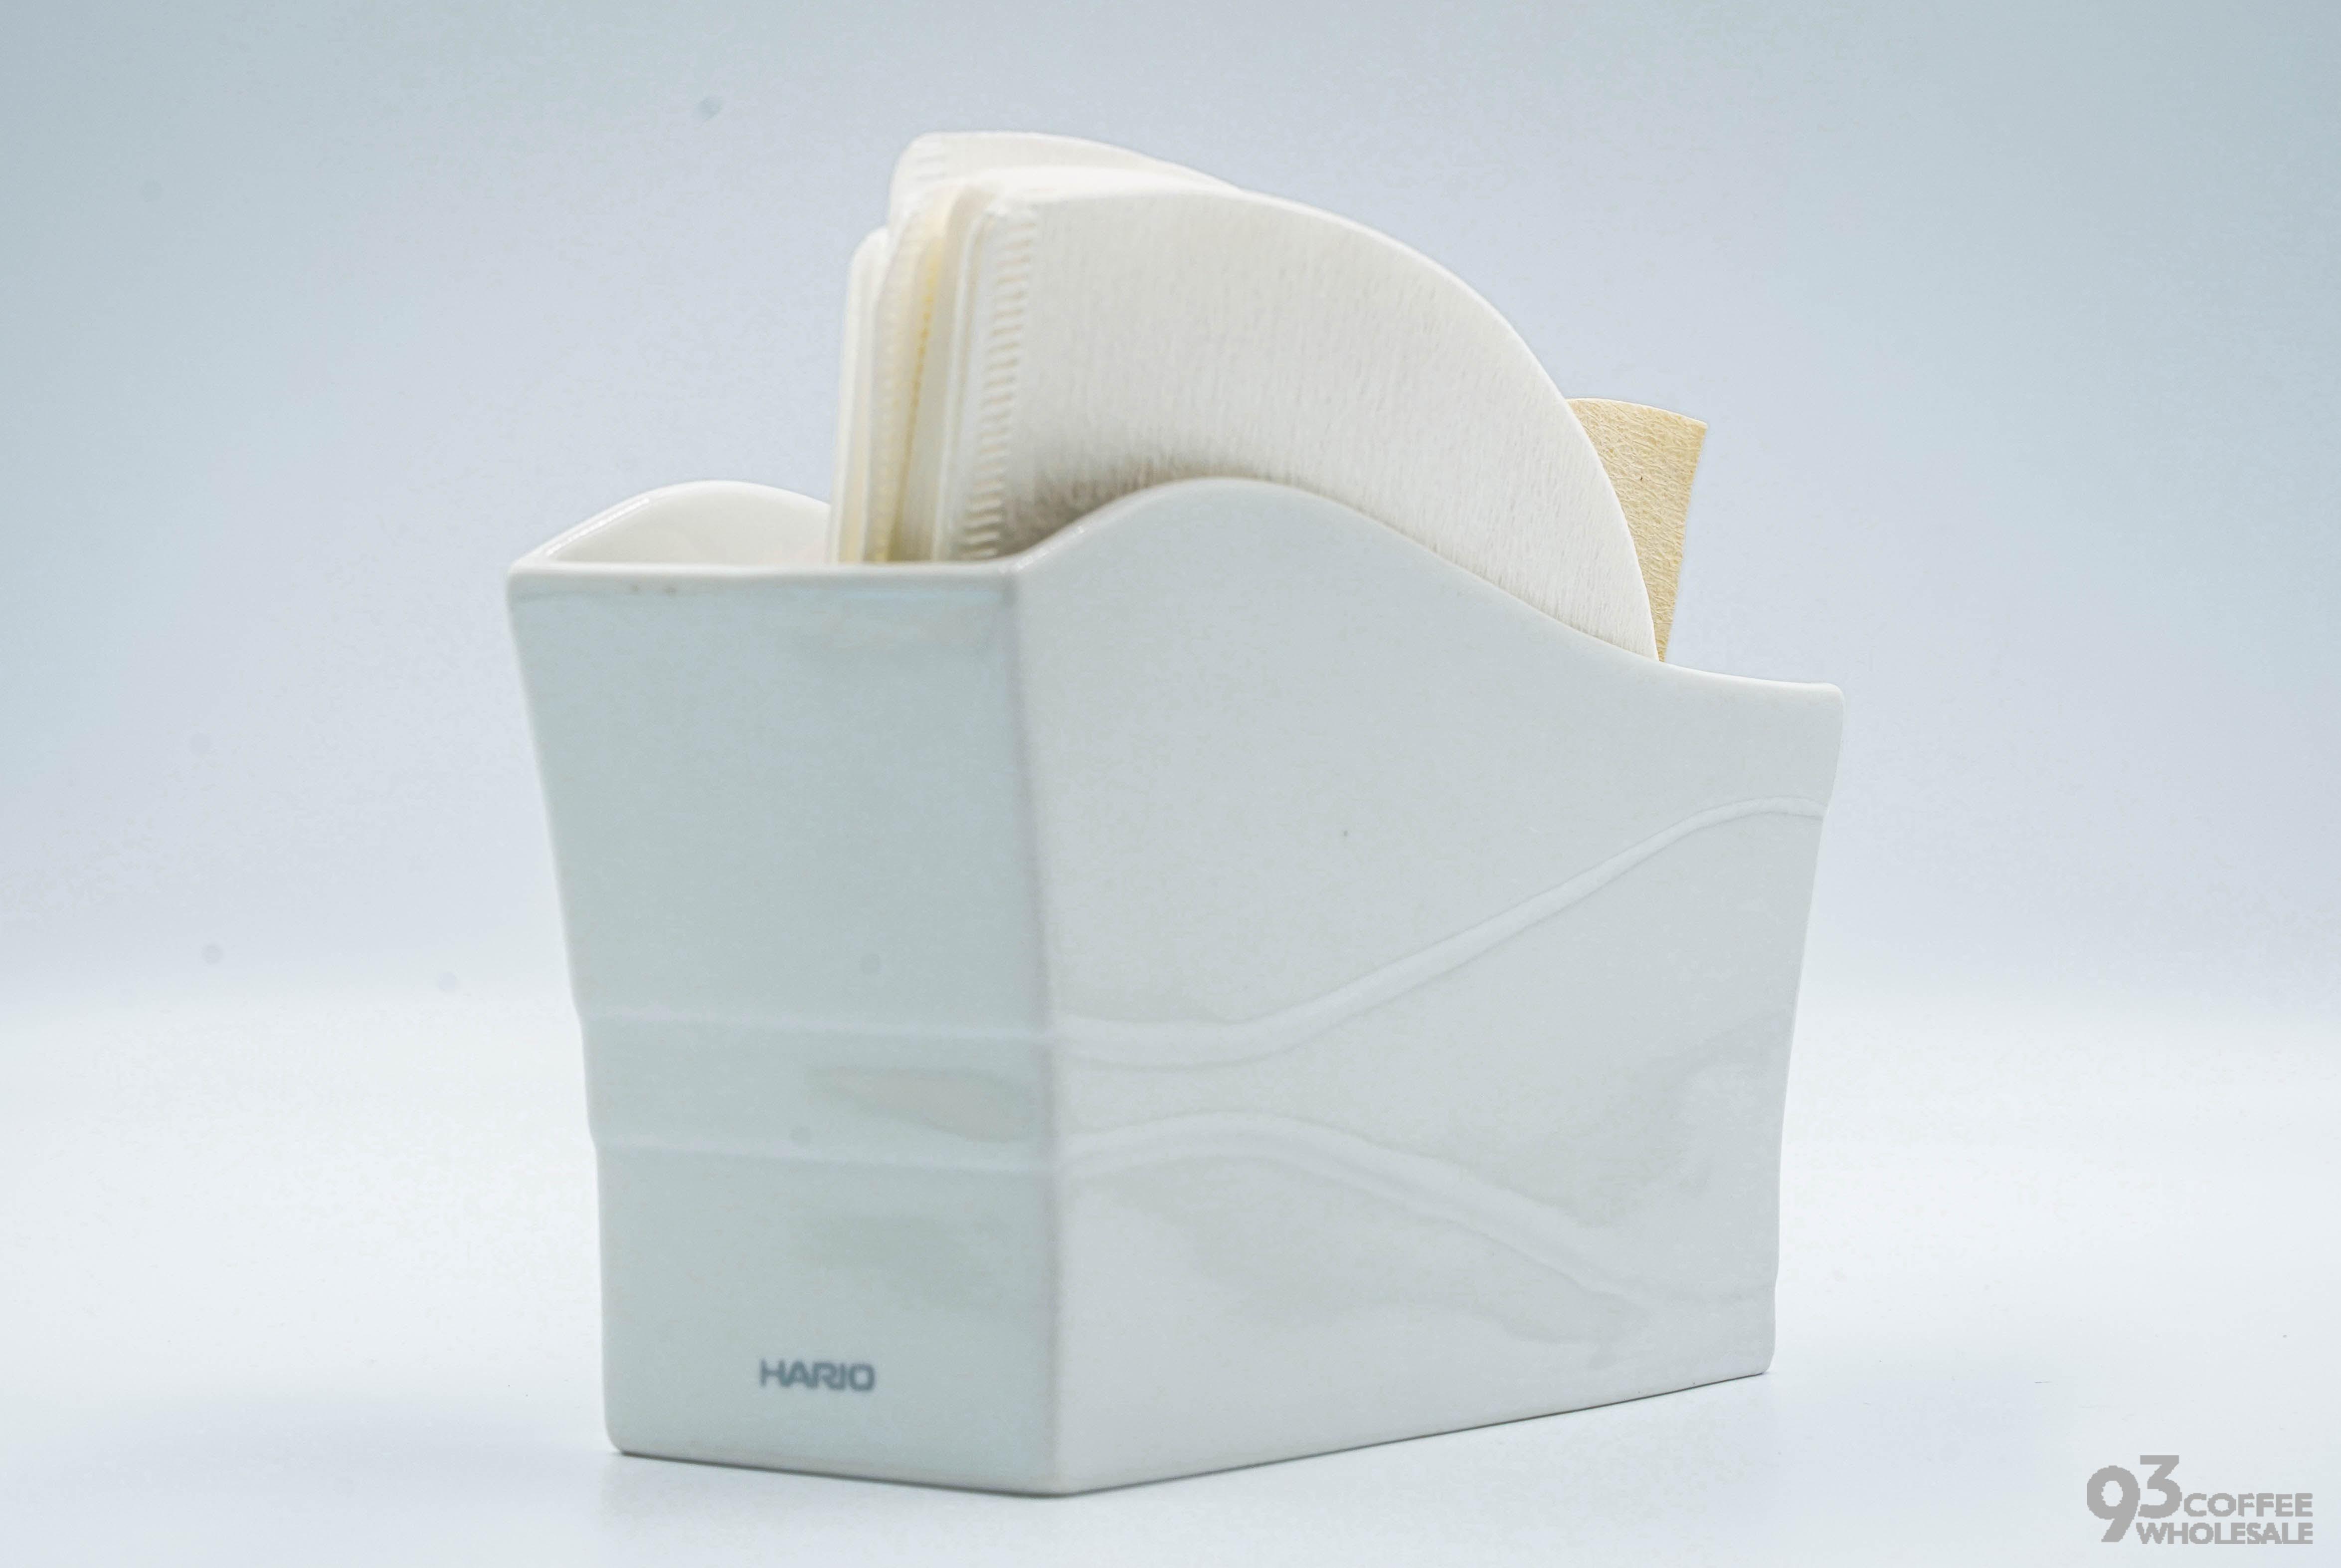 Hario 陶瓷濾紙架 有田燒 濾紙專用架 VPS-100W 『93 coffee wholesale』